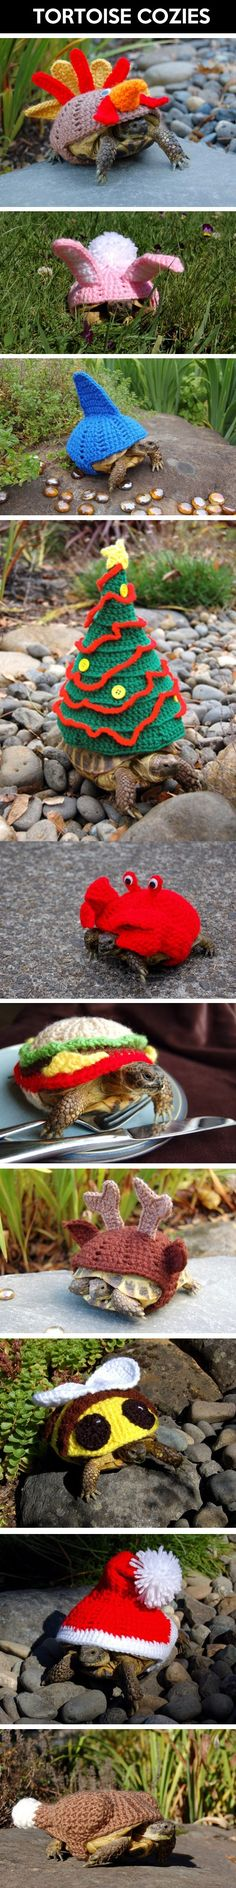 turtle funny, anim, stuff, tortoise cozies, pet